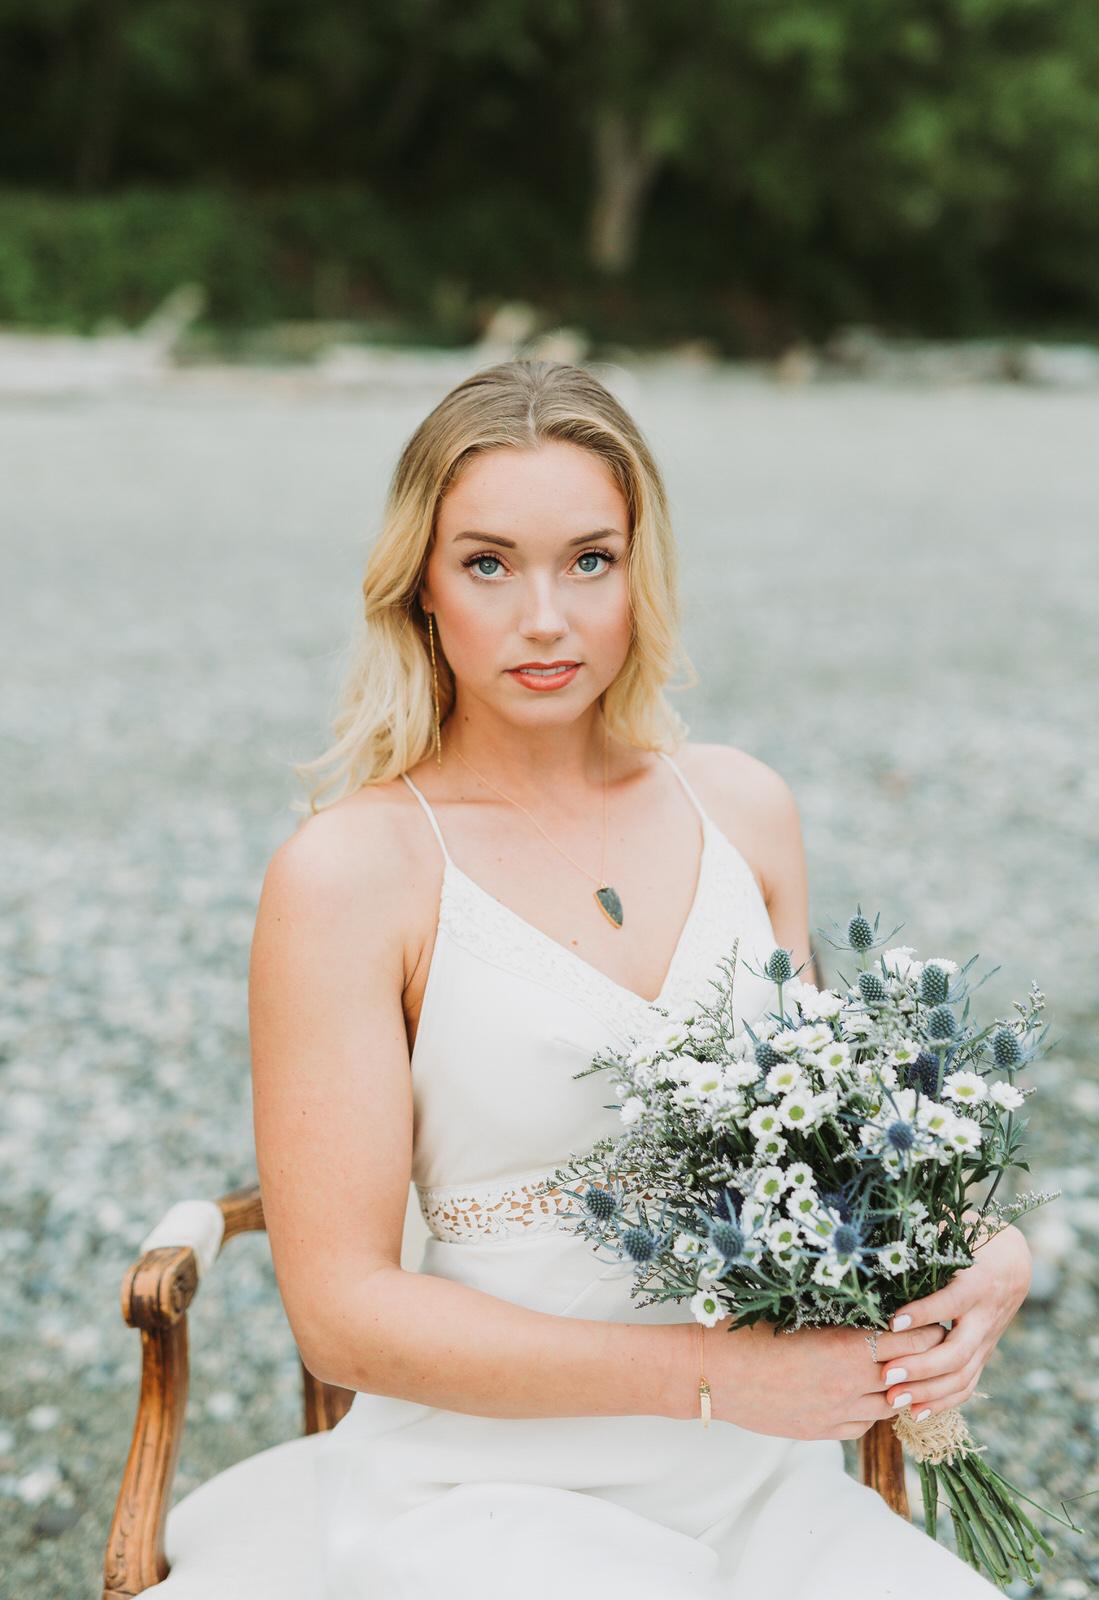 Jennifer Picard Photography - Vancouver Wedding Photographer - Sunshine Coast Wedding Photographer - Bridal InspirationIMG_8864.jpg